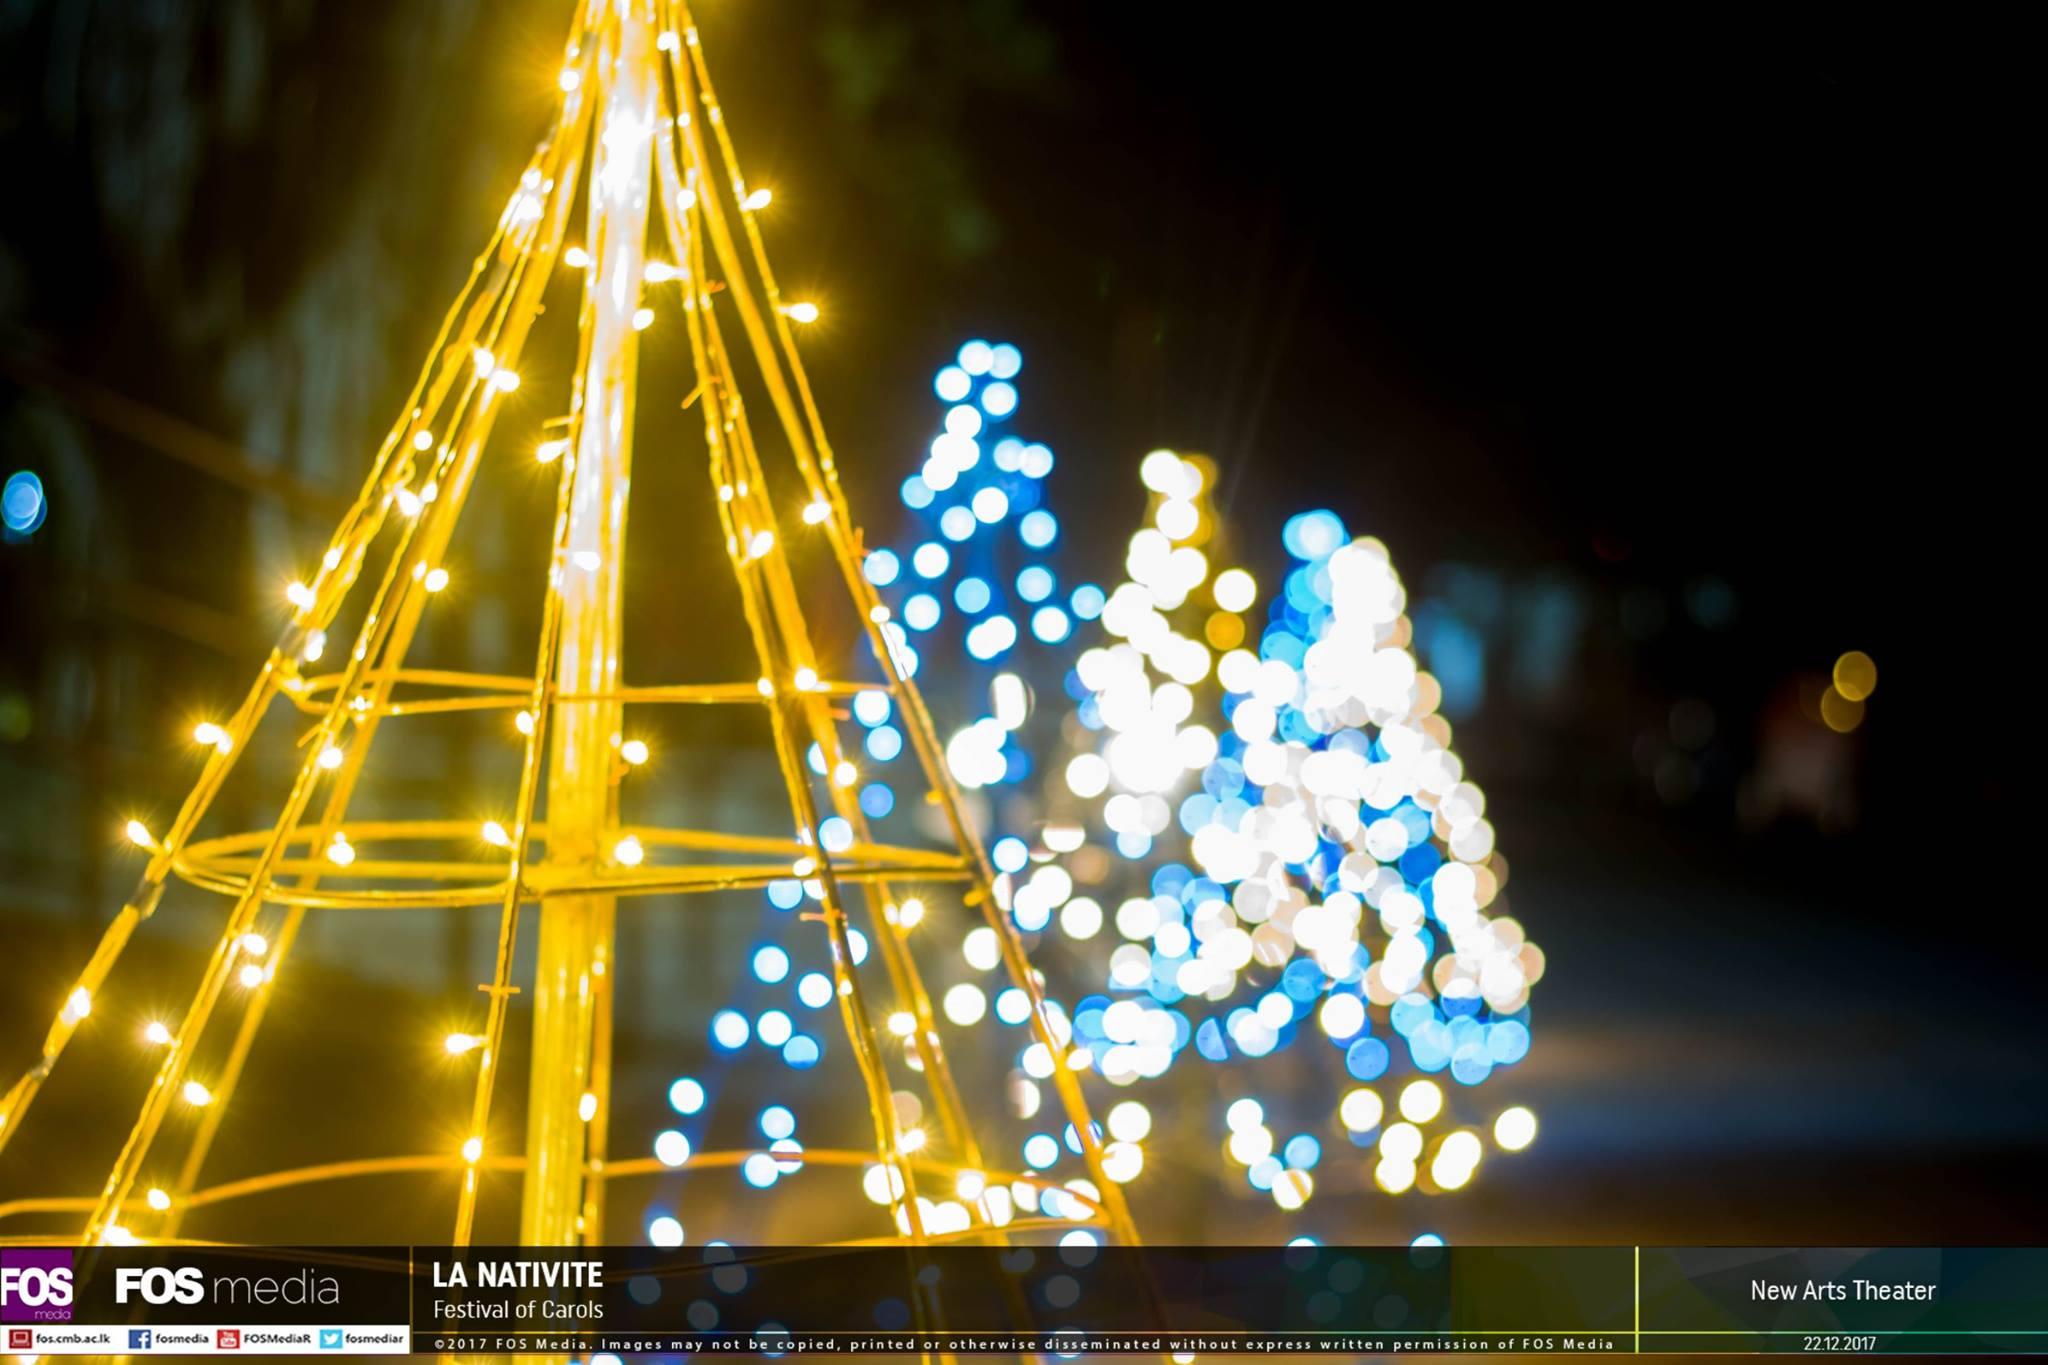 LA NATIVITE – Festival of Carols